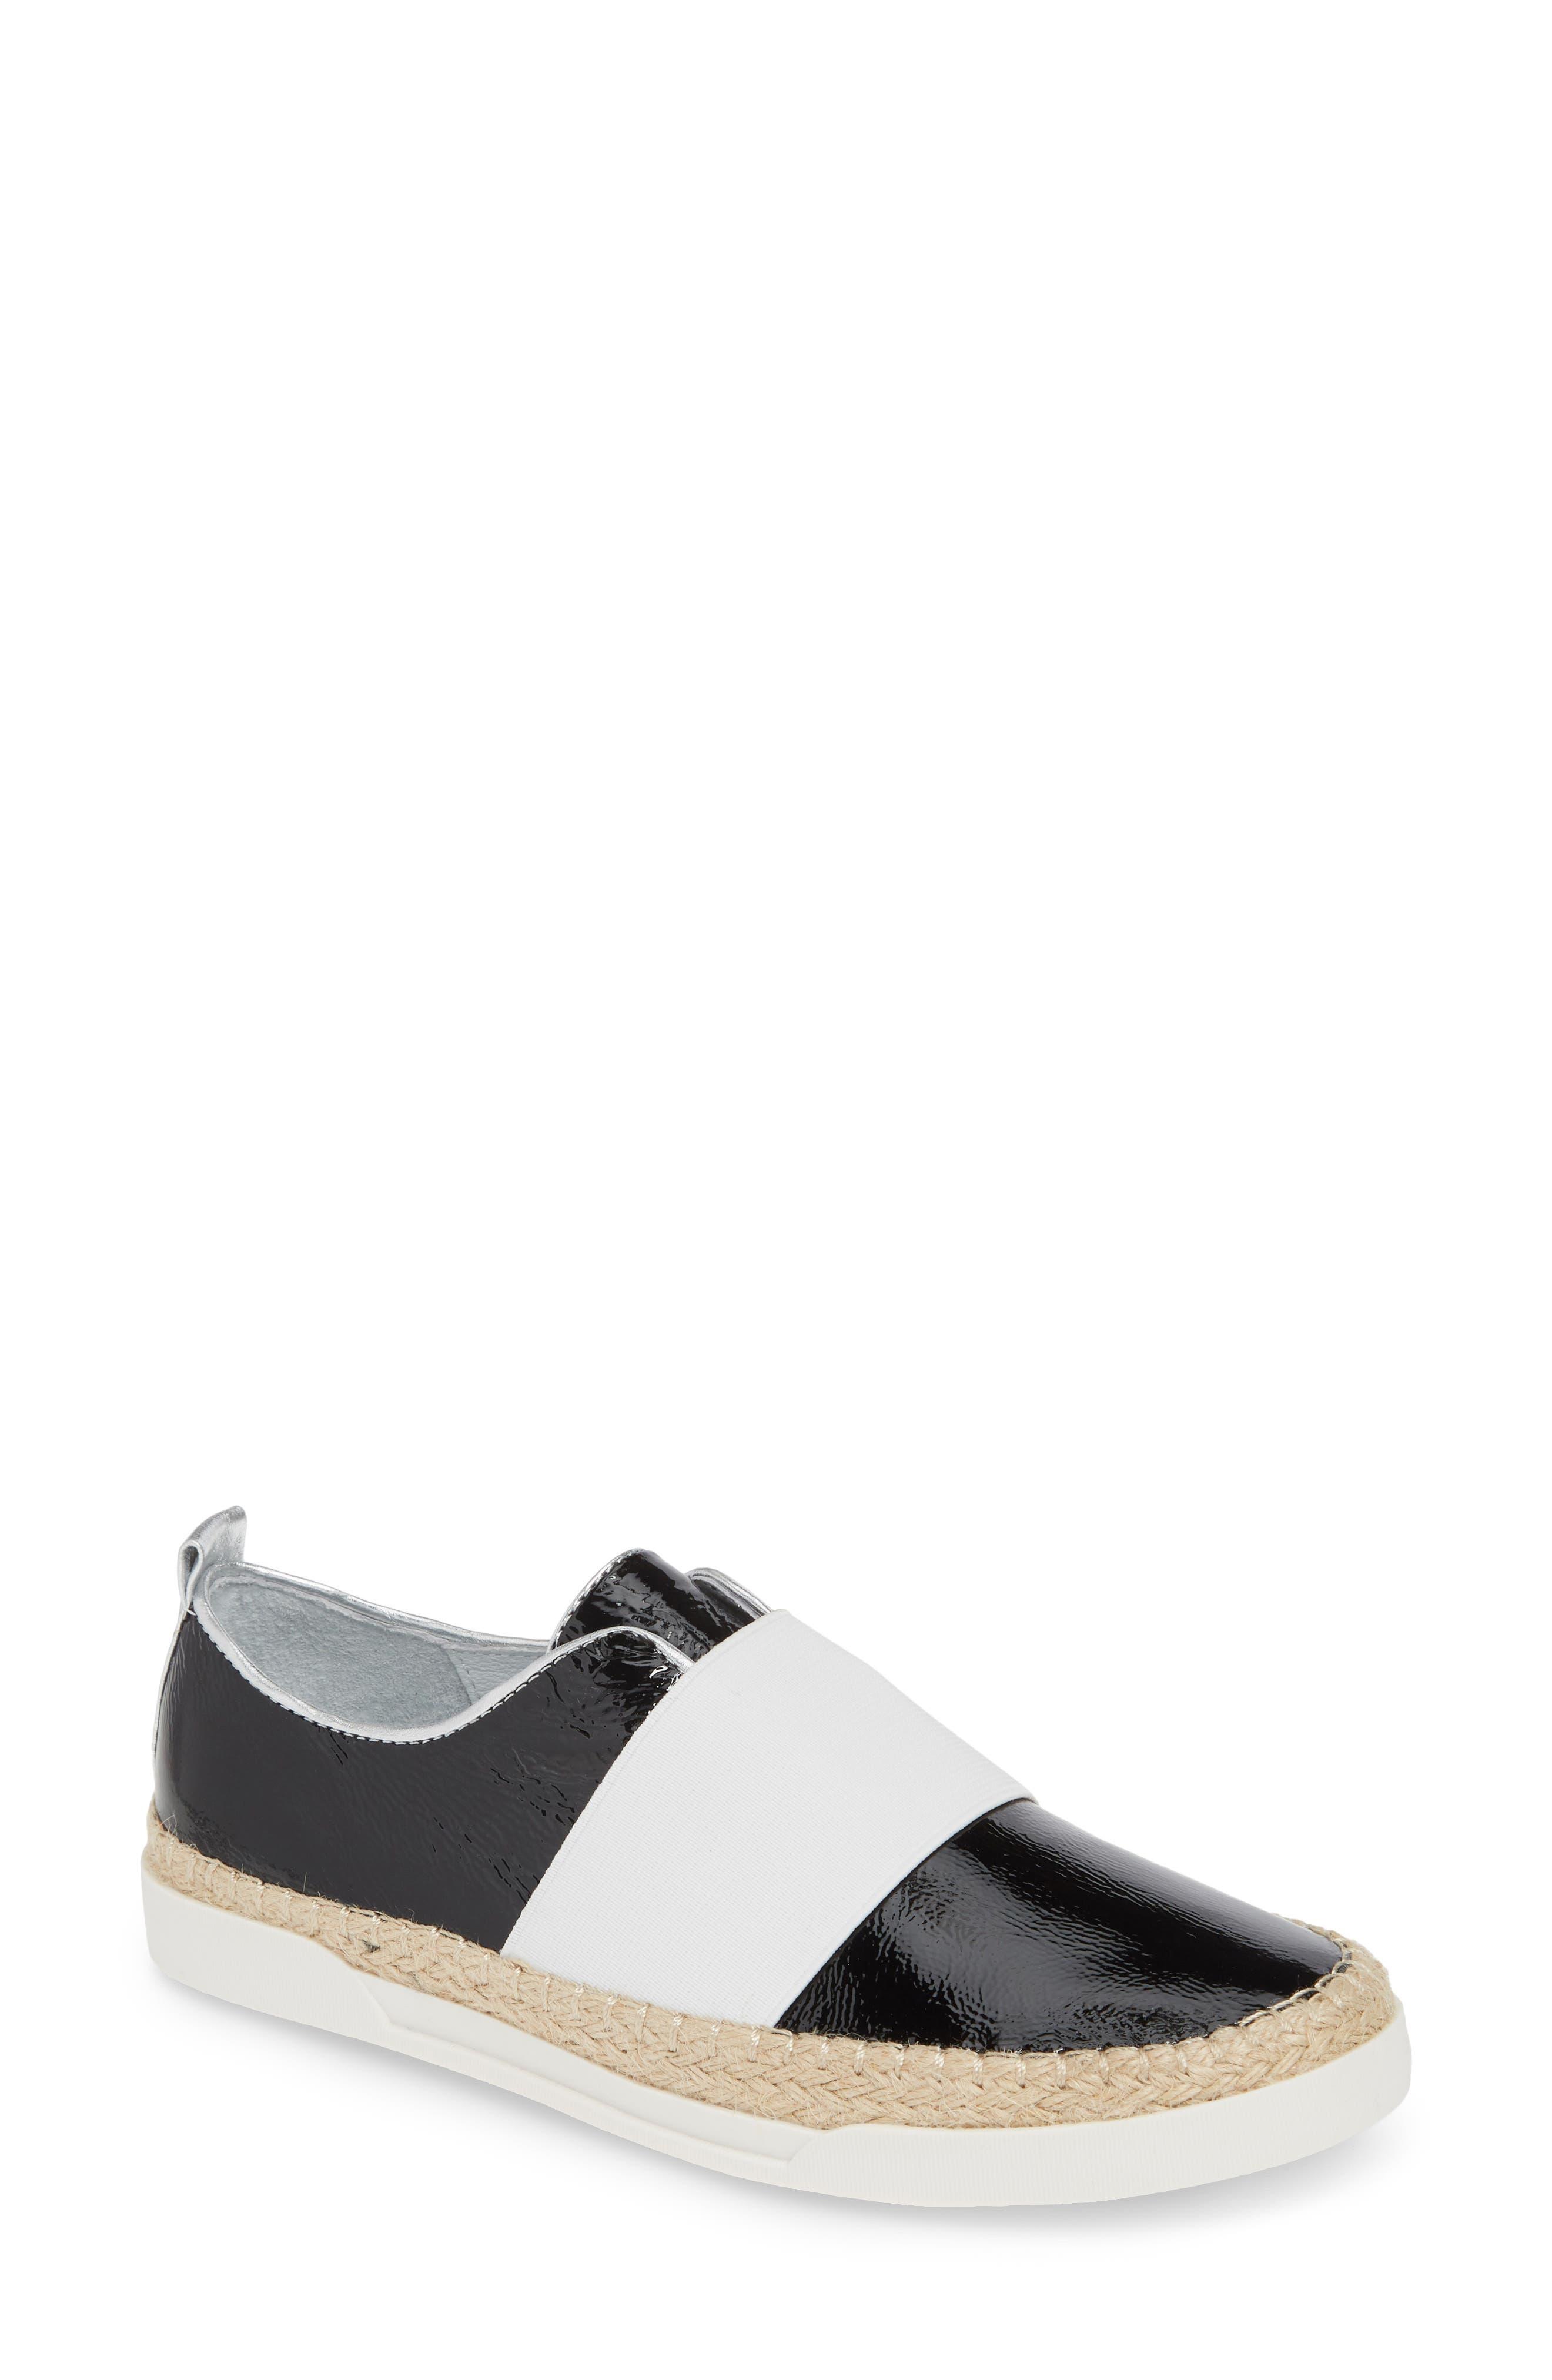 Johnston & Murphy Victoria Slip-On Sneaker, Black